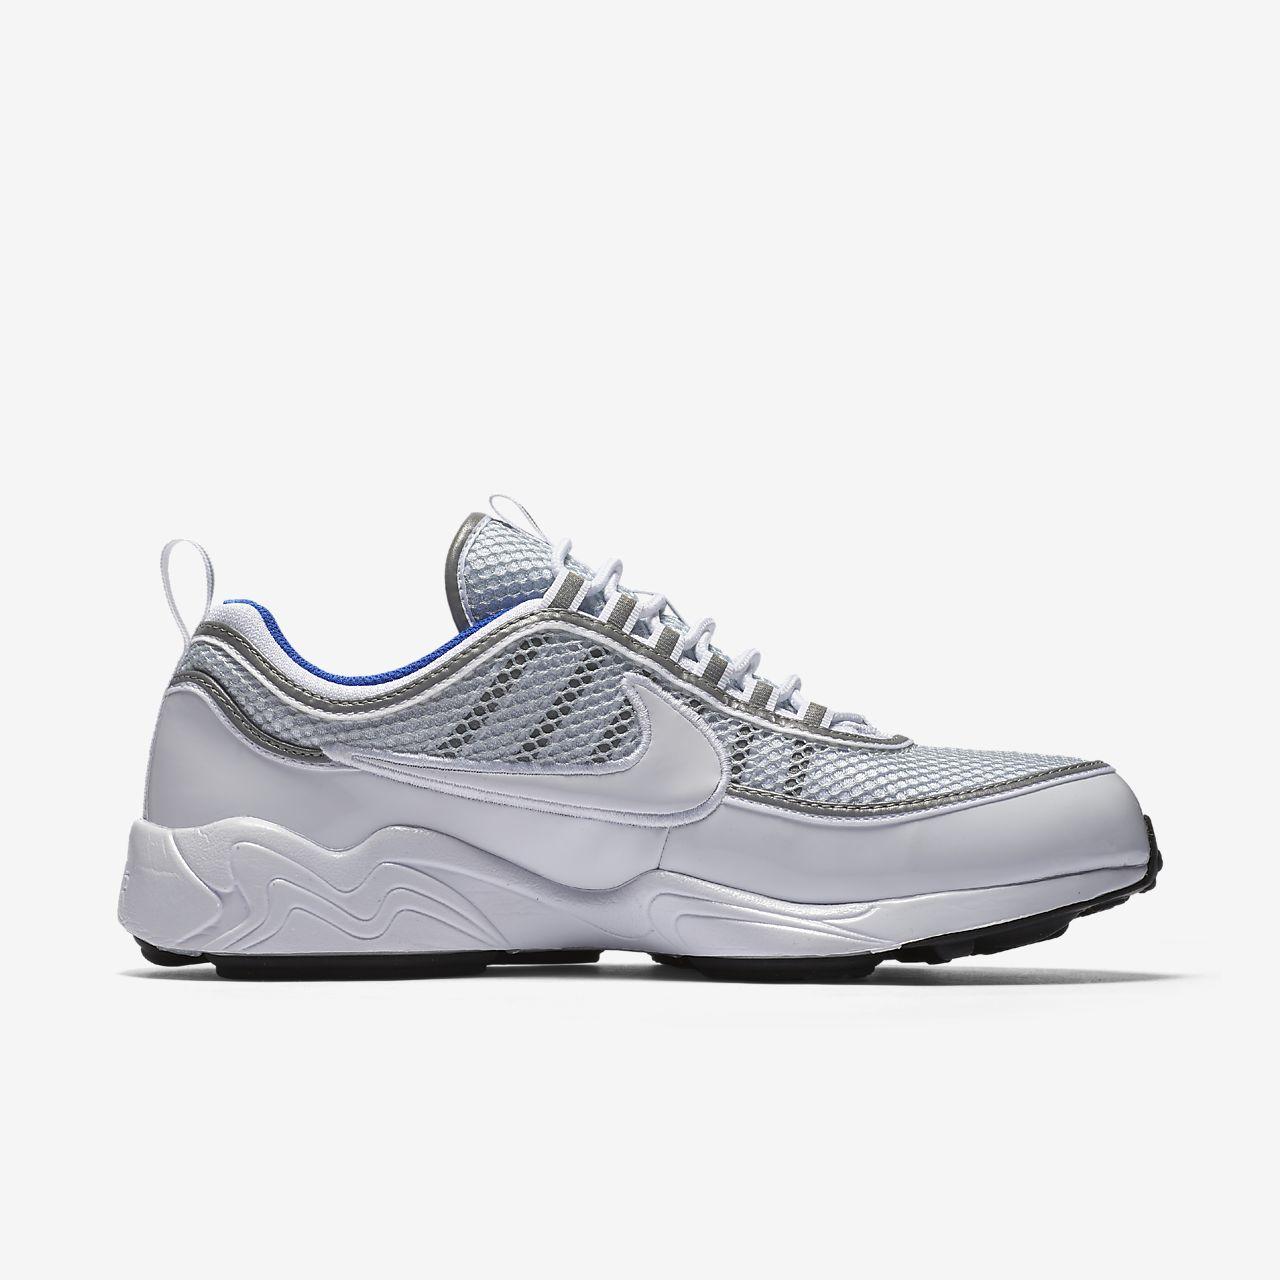 ... Nike Air Zoom Spiridon '16 Herenschoen